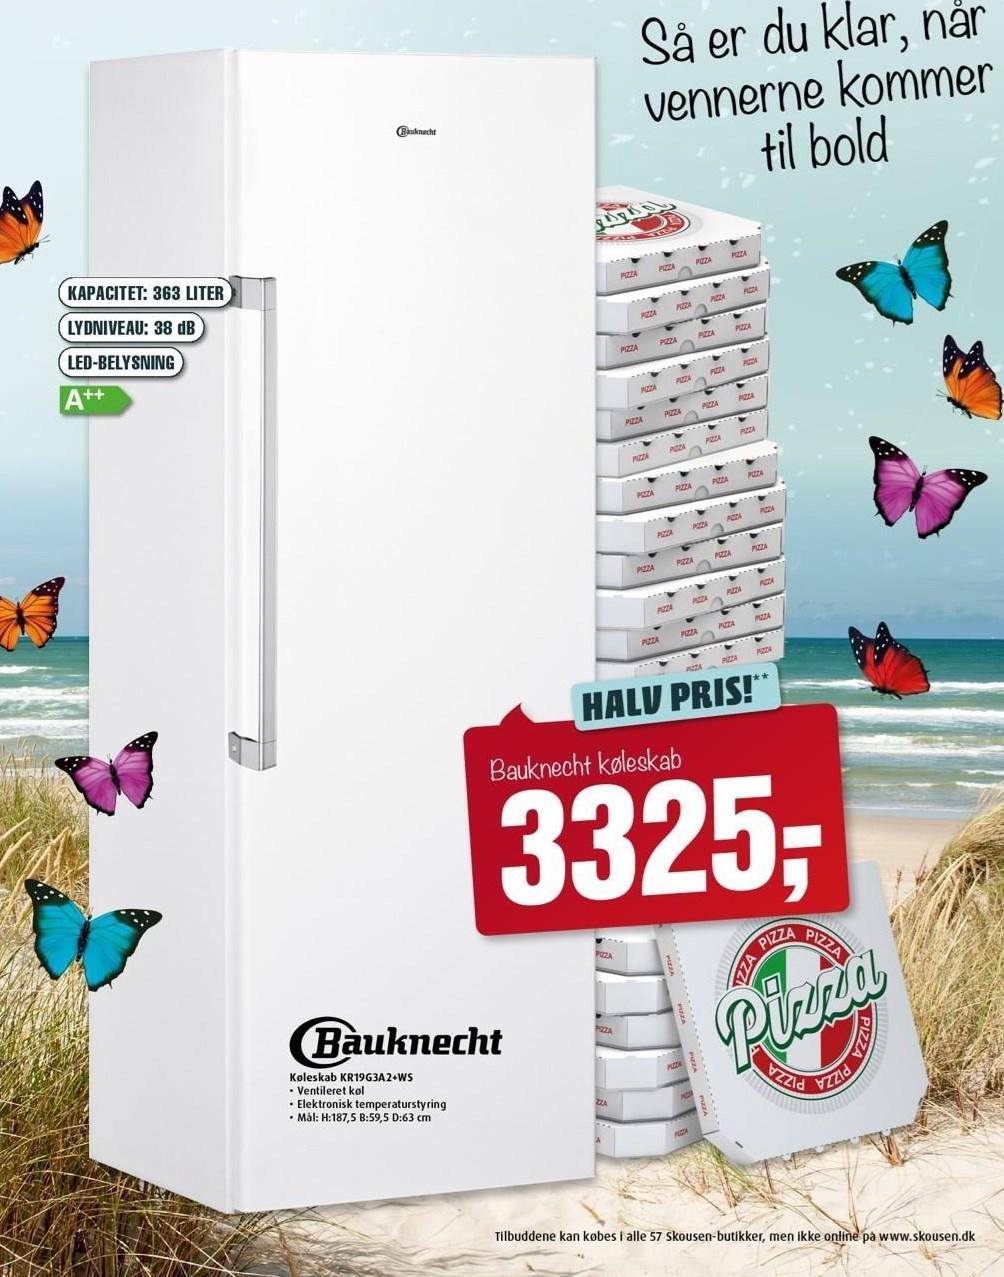 Bauknecht køleskab